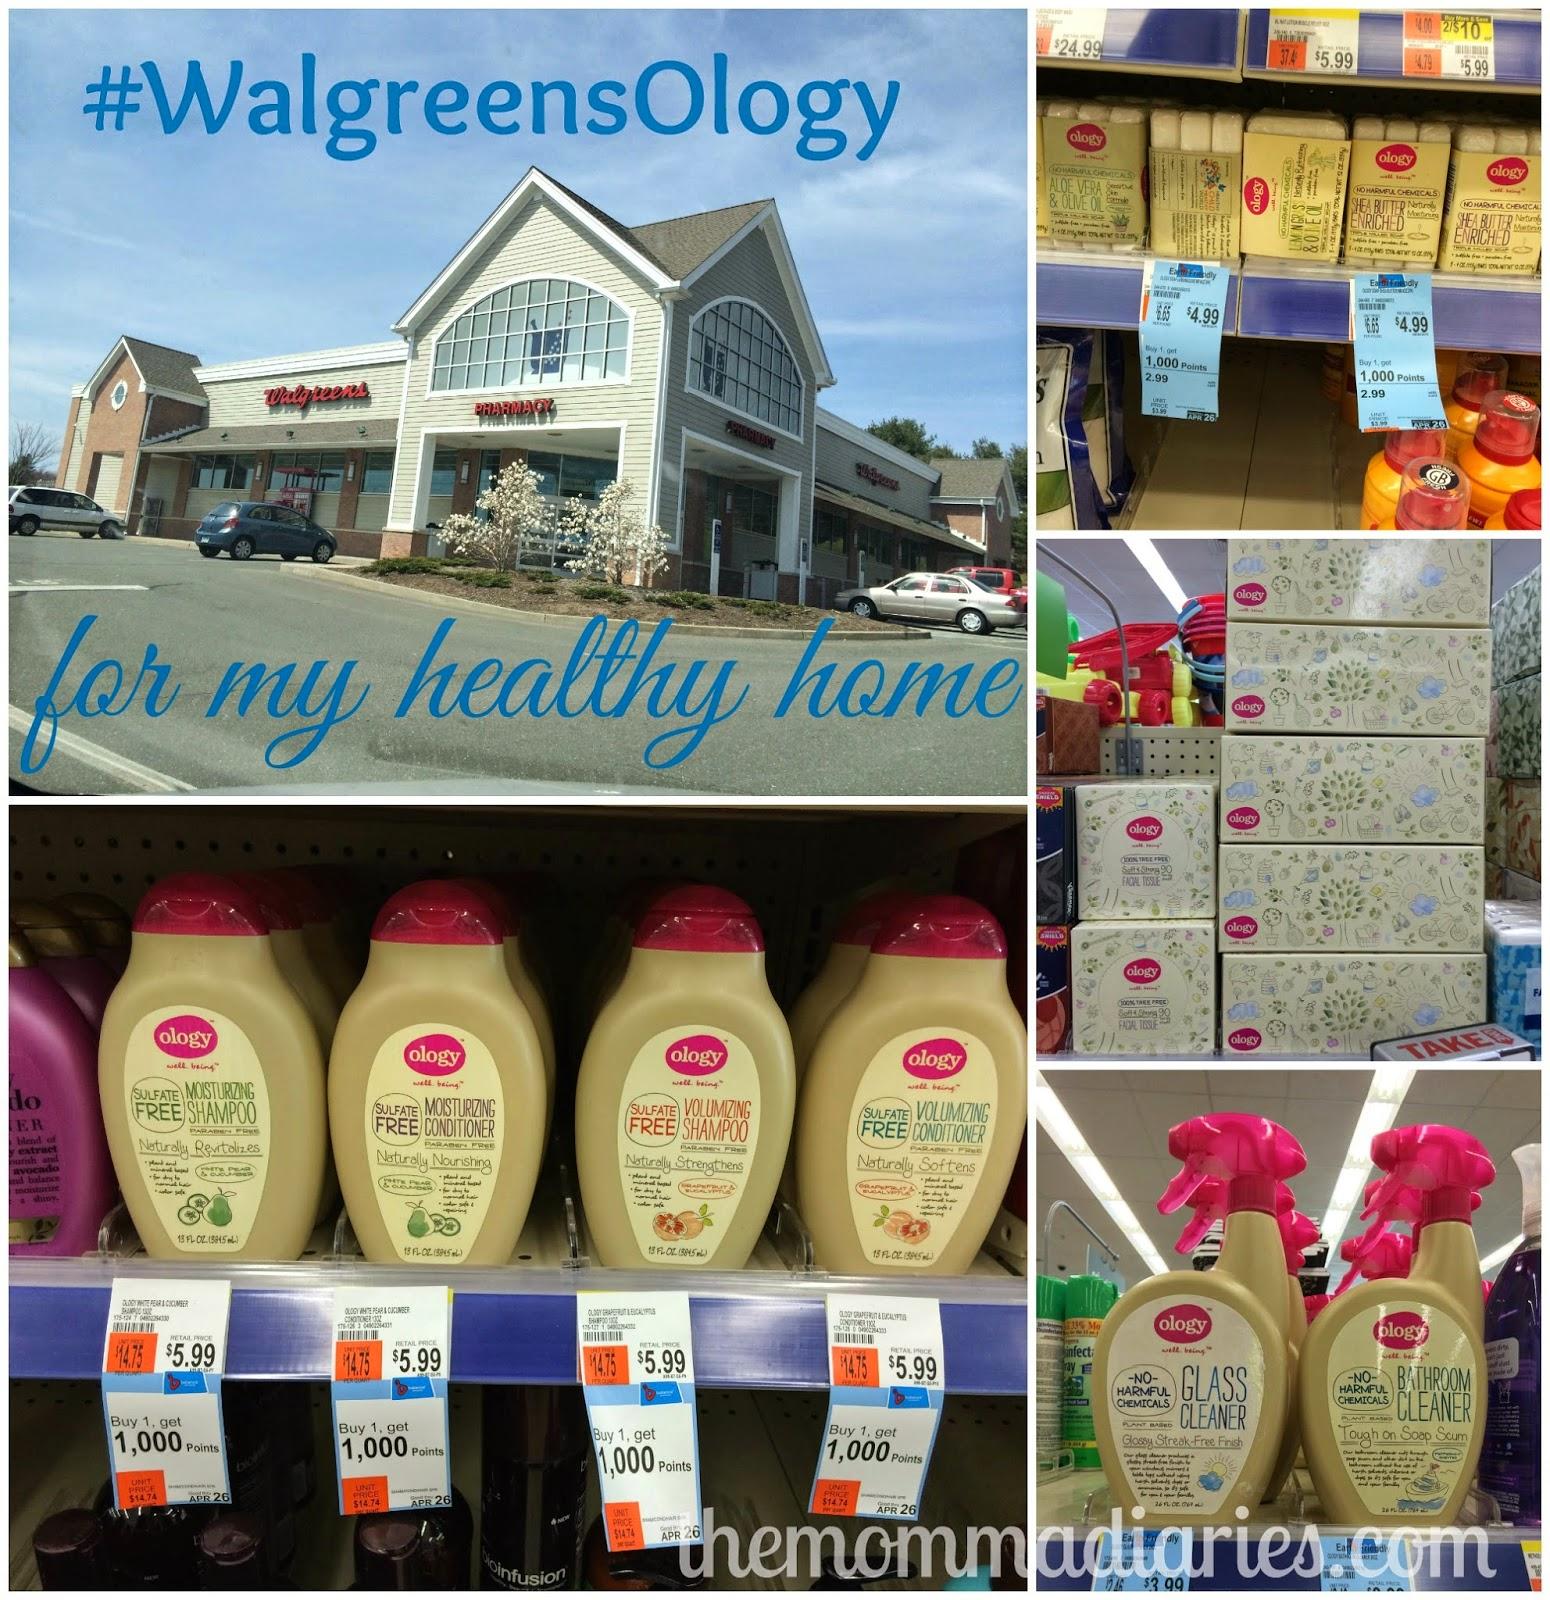 #WalgreensOlogy